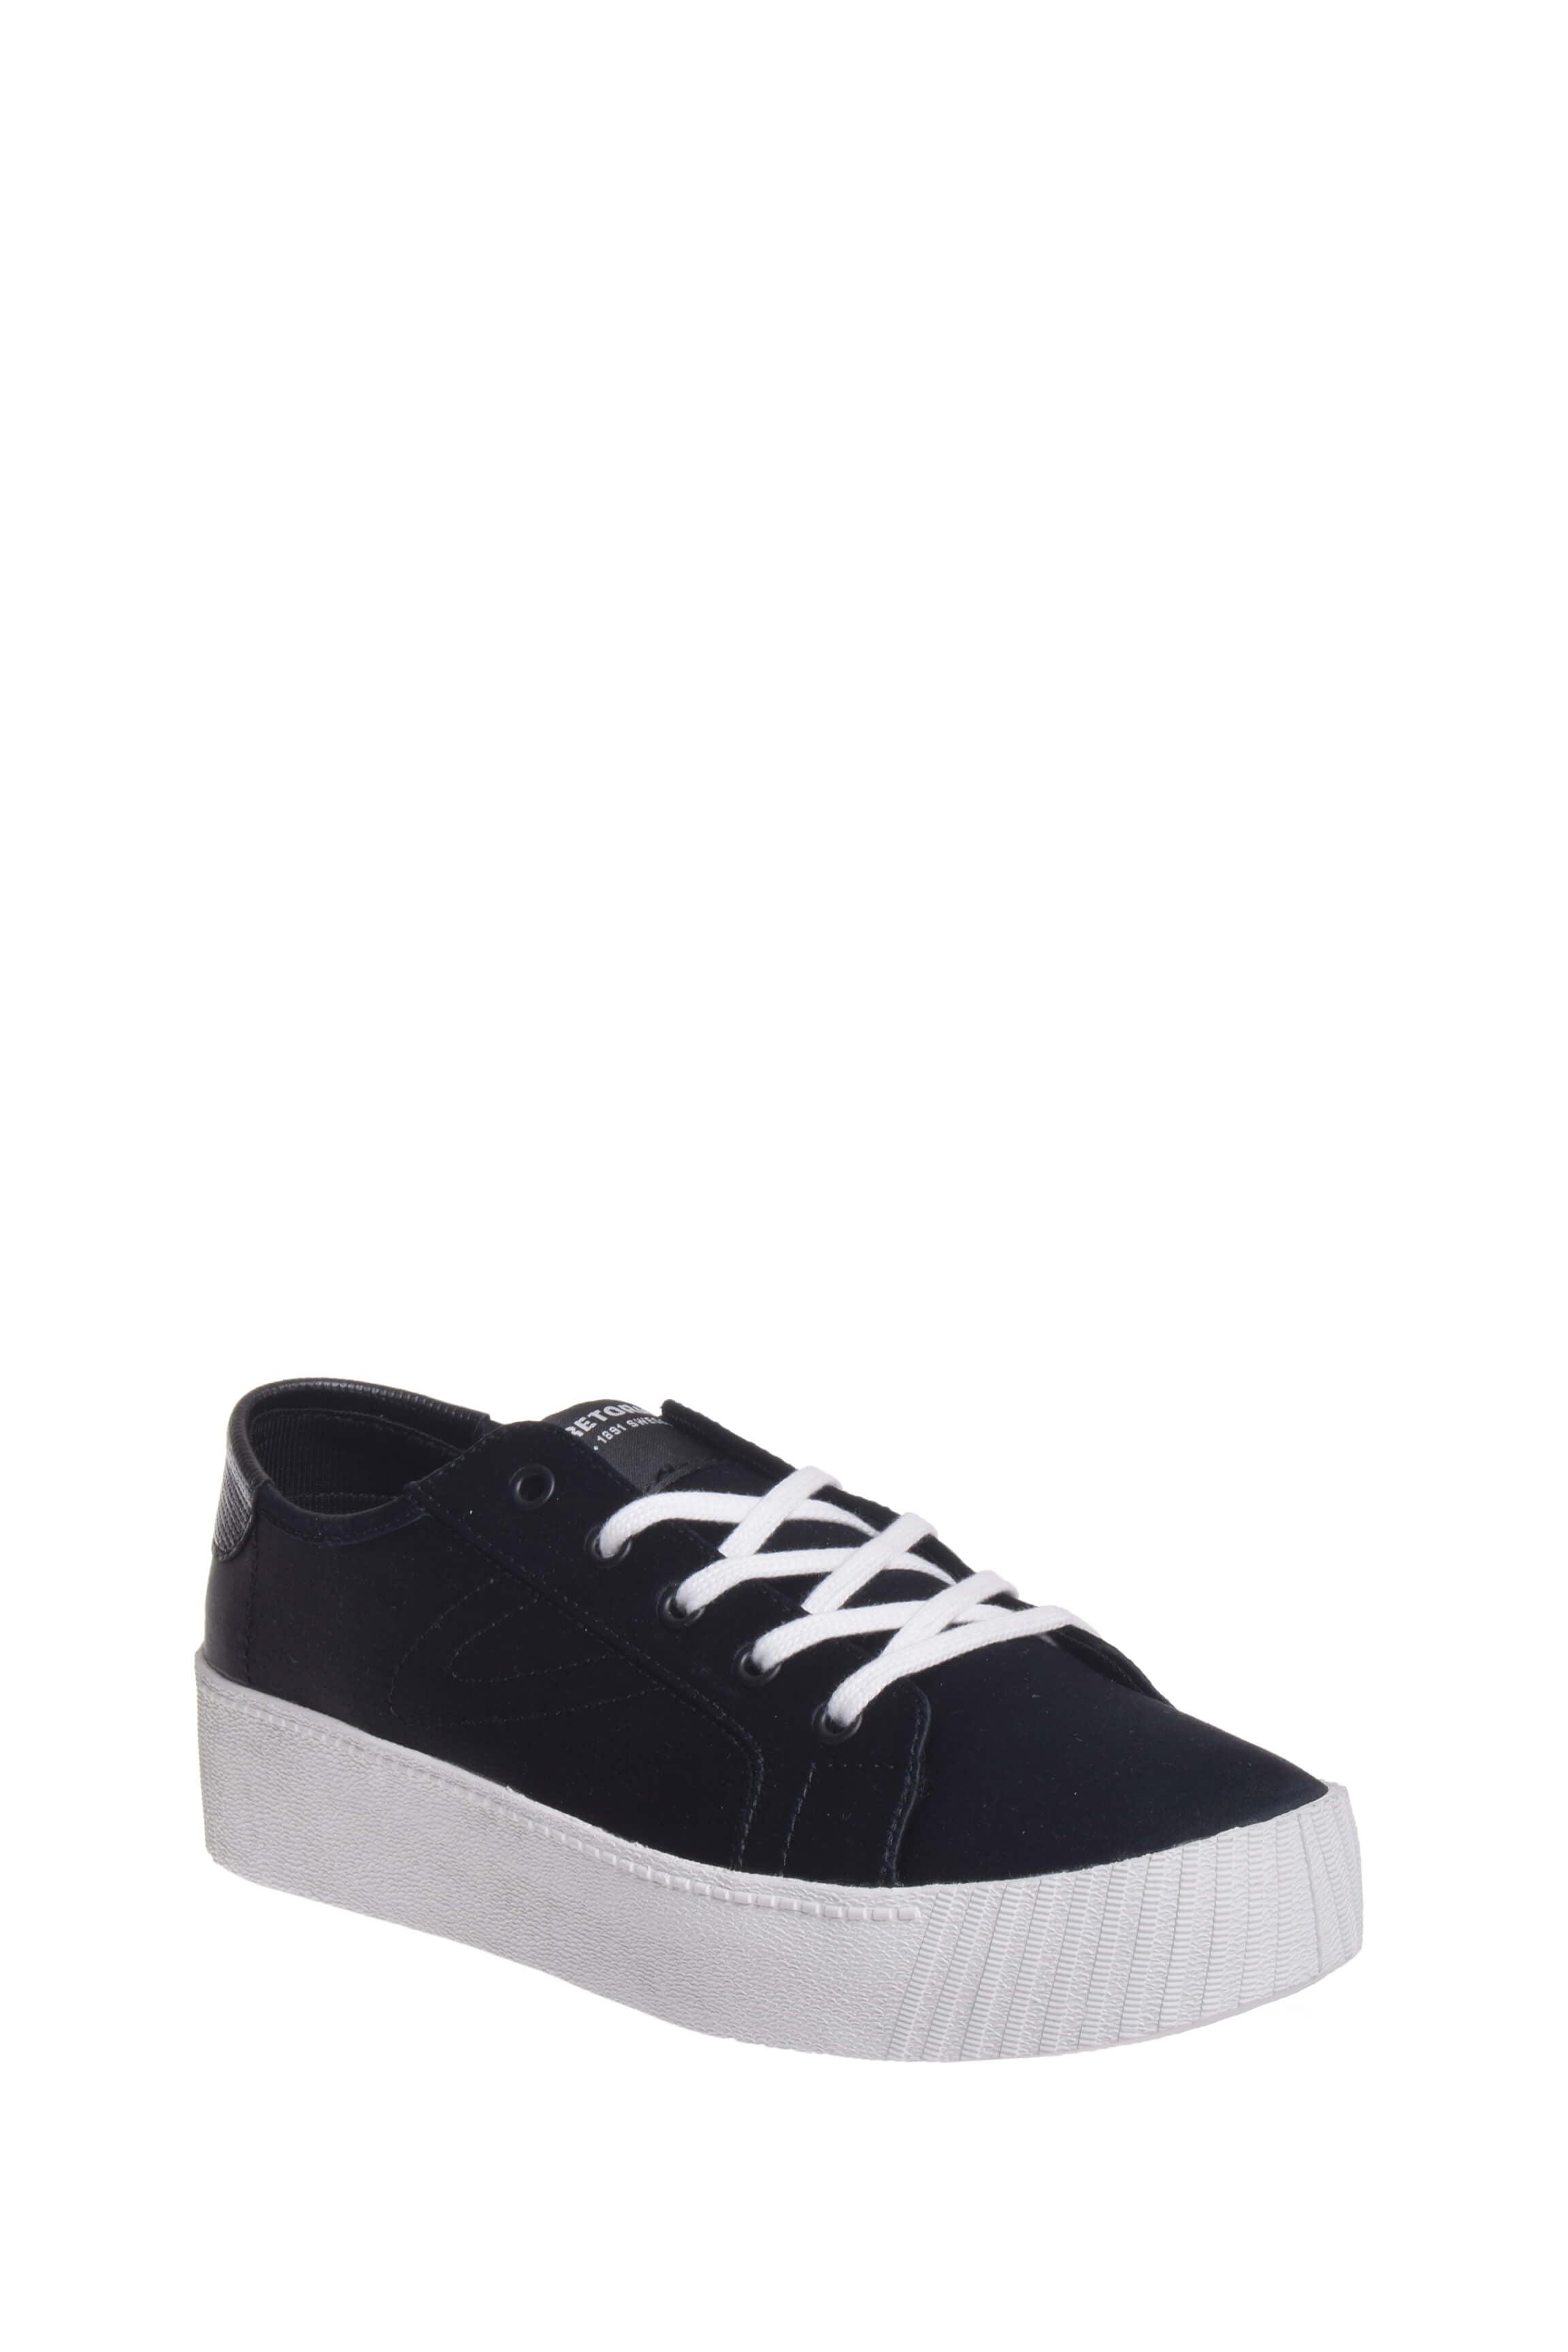 Tretorn W Blaire 7 Platform Sneaker Black Satin by